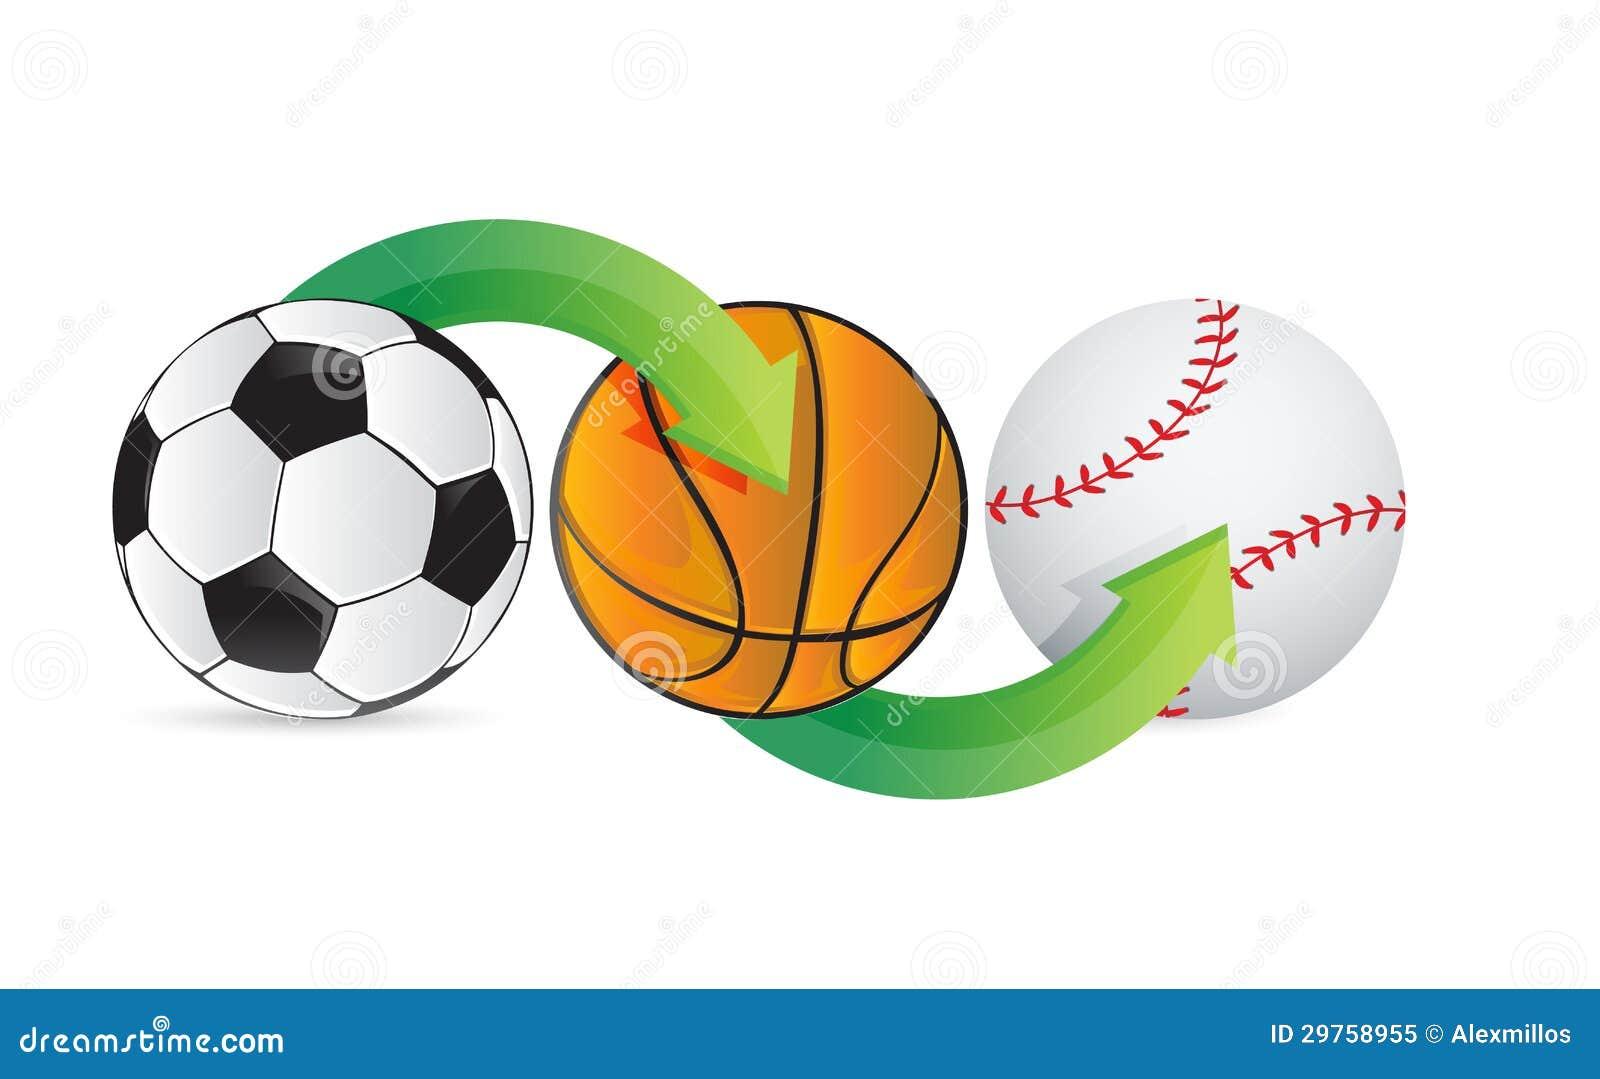 Folâtre des boules le football, le football, panier et base-ball